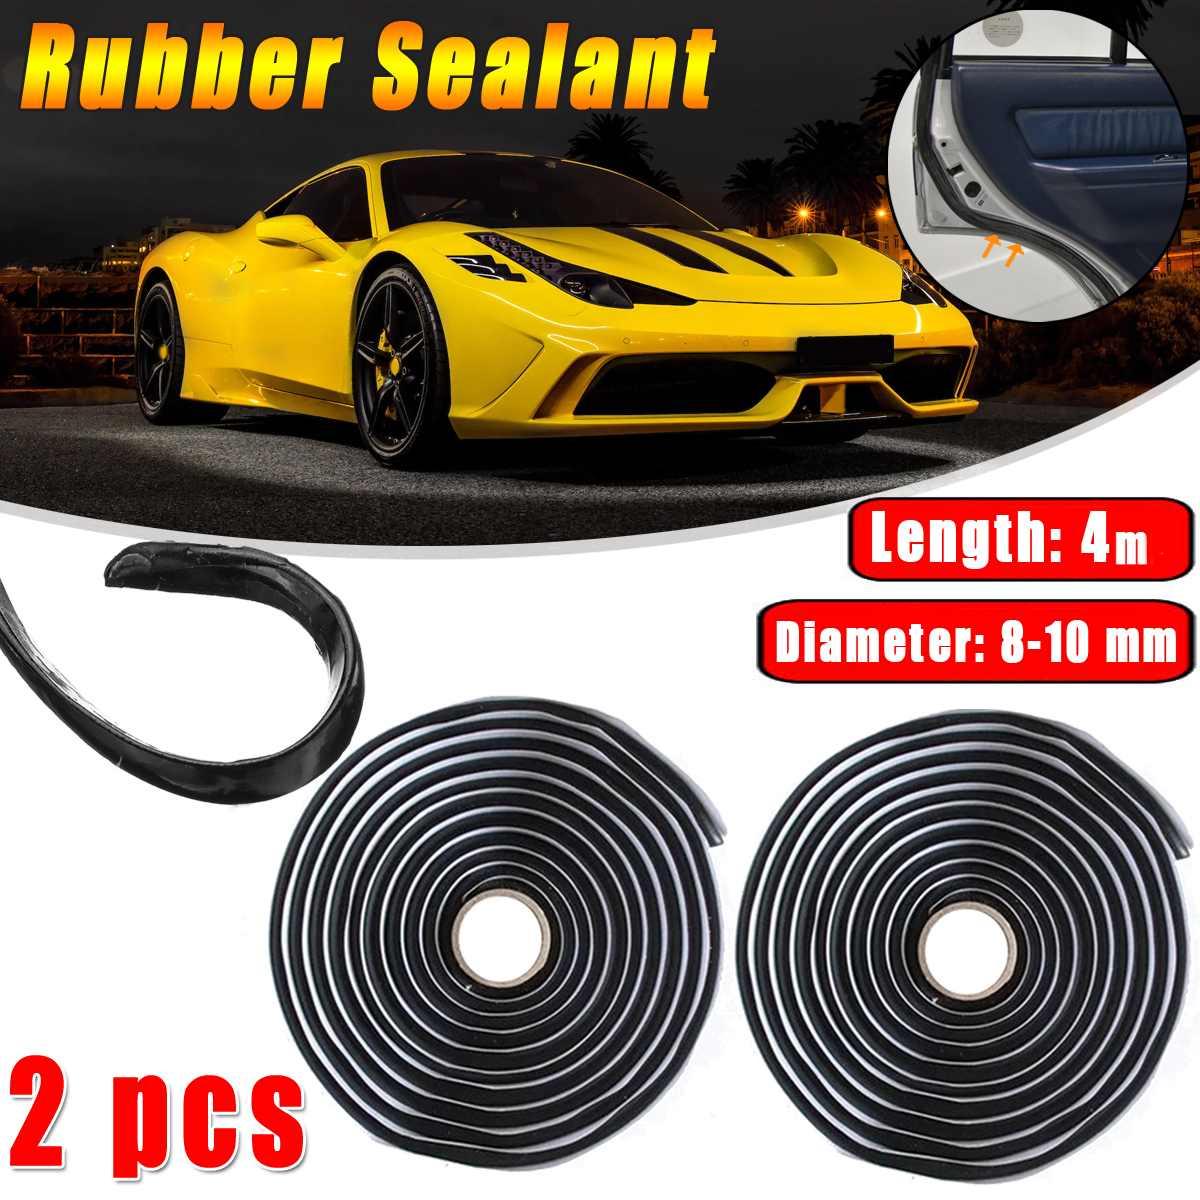 2pcs Car Rubber Sealant 4 Meters Butyl Glue Headlight Windshield Retrofit Reseal Hid Headlamps Taillight Shield Glue Tapes